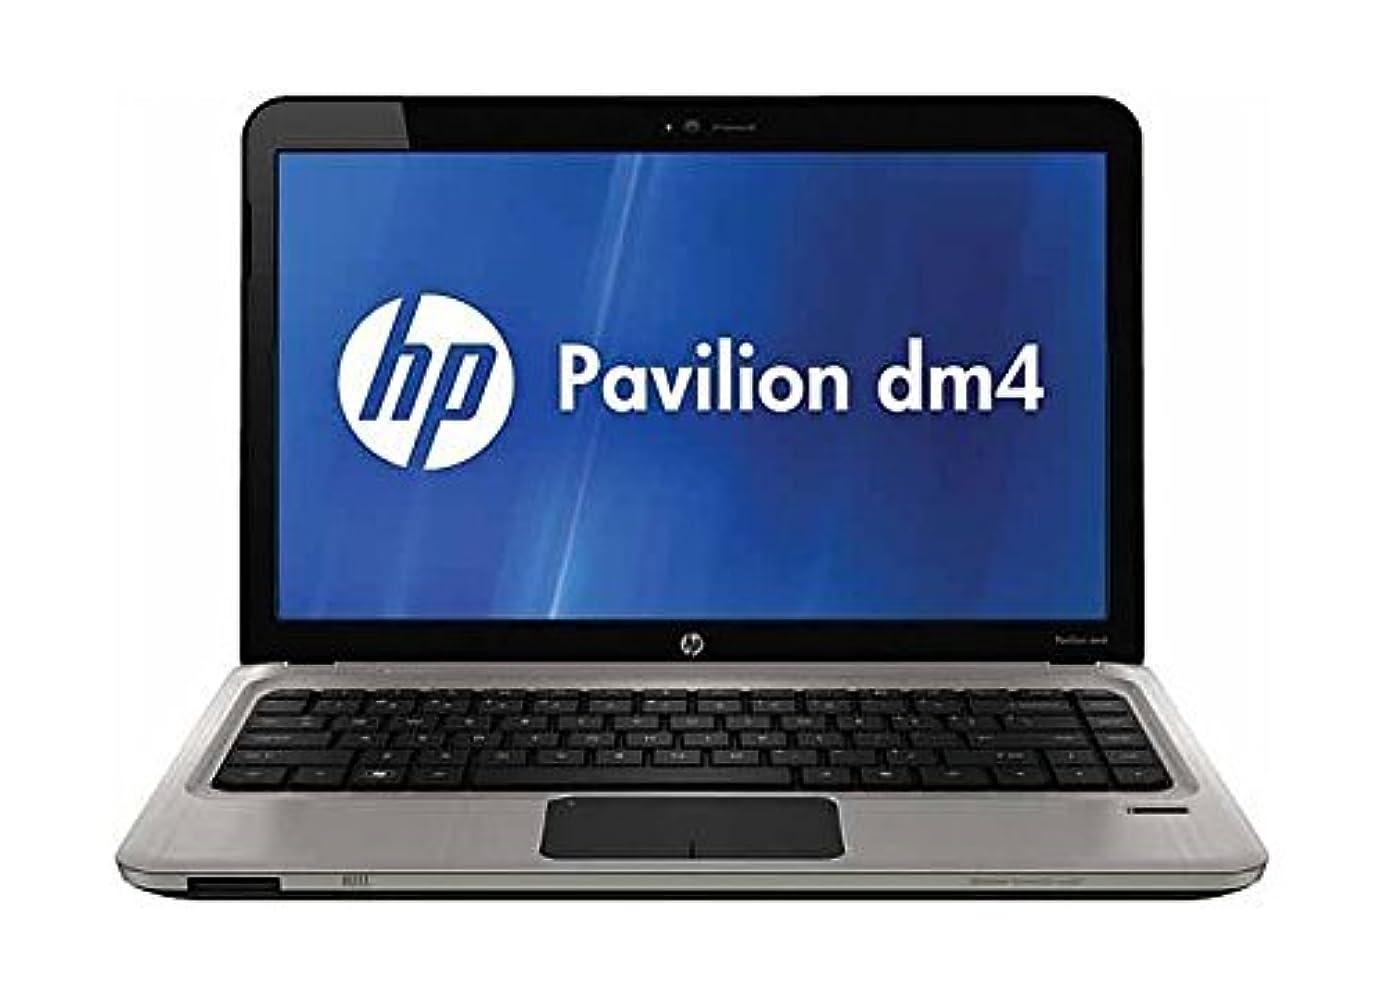 HP dm4-2195us (14.0-inch Screen) Laptop xuq2530980